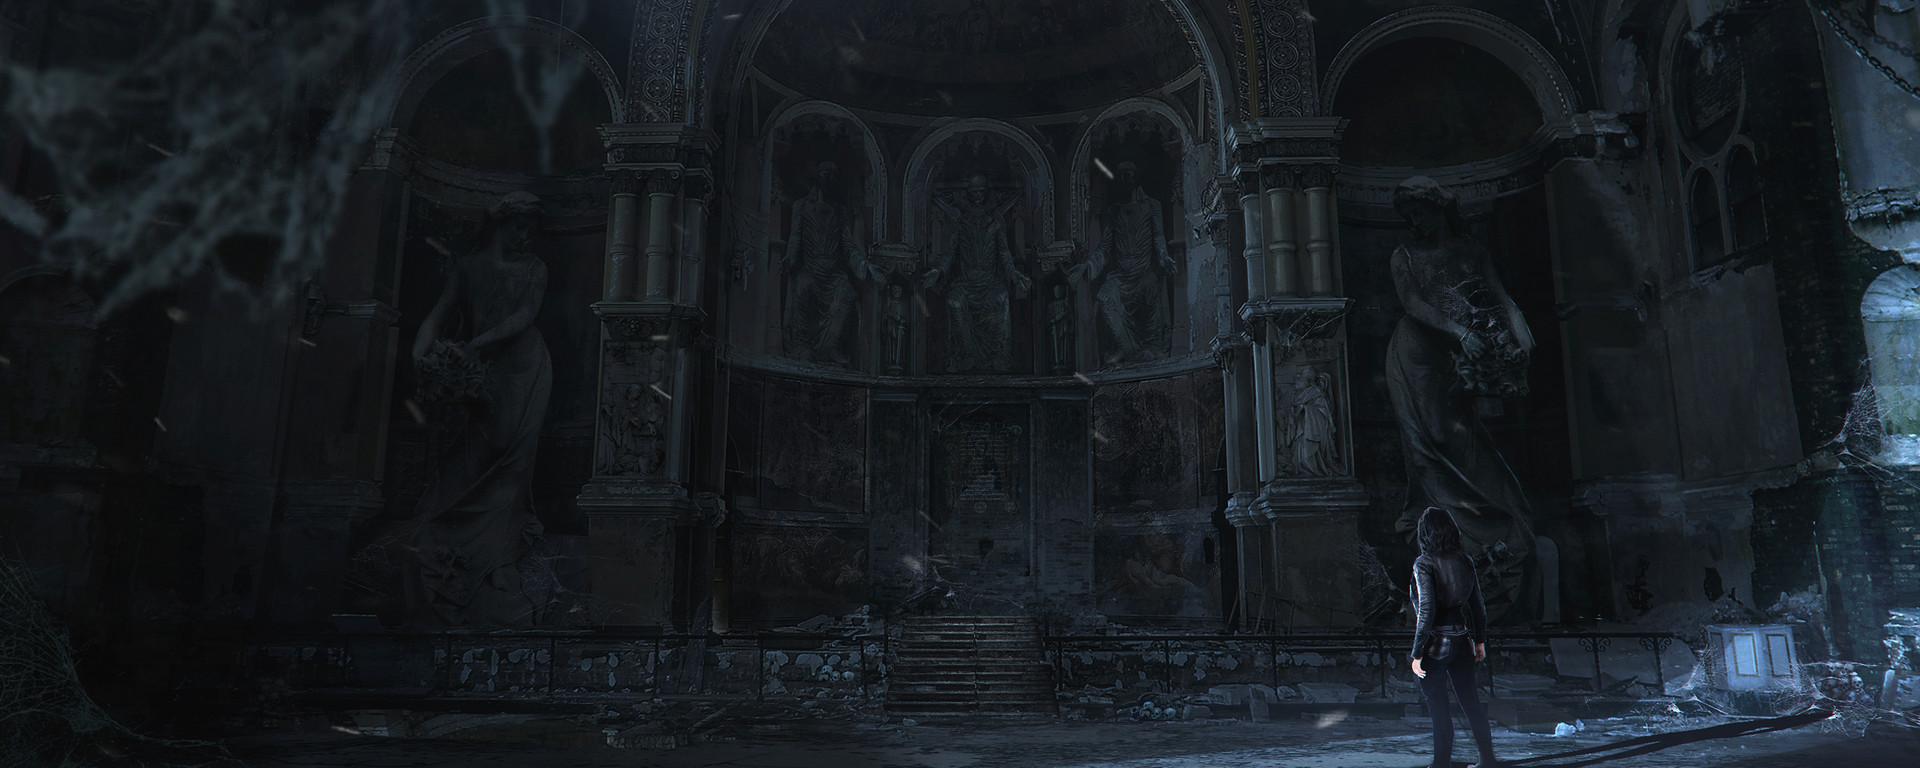 Michael morris crypt